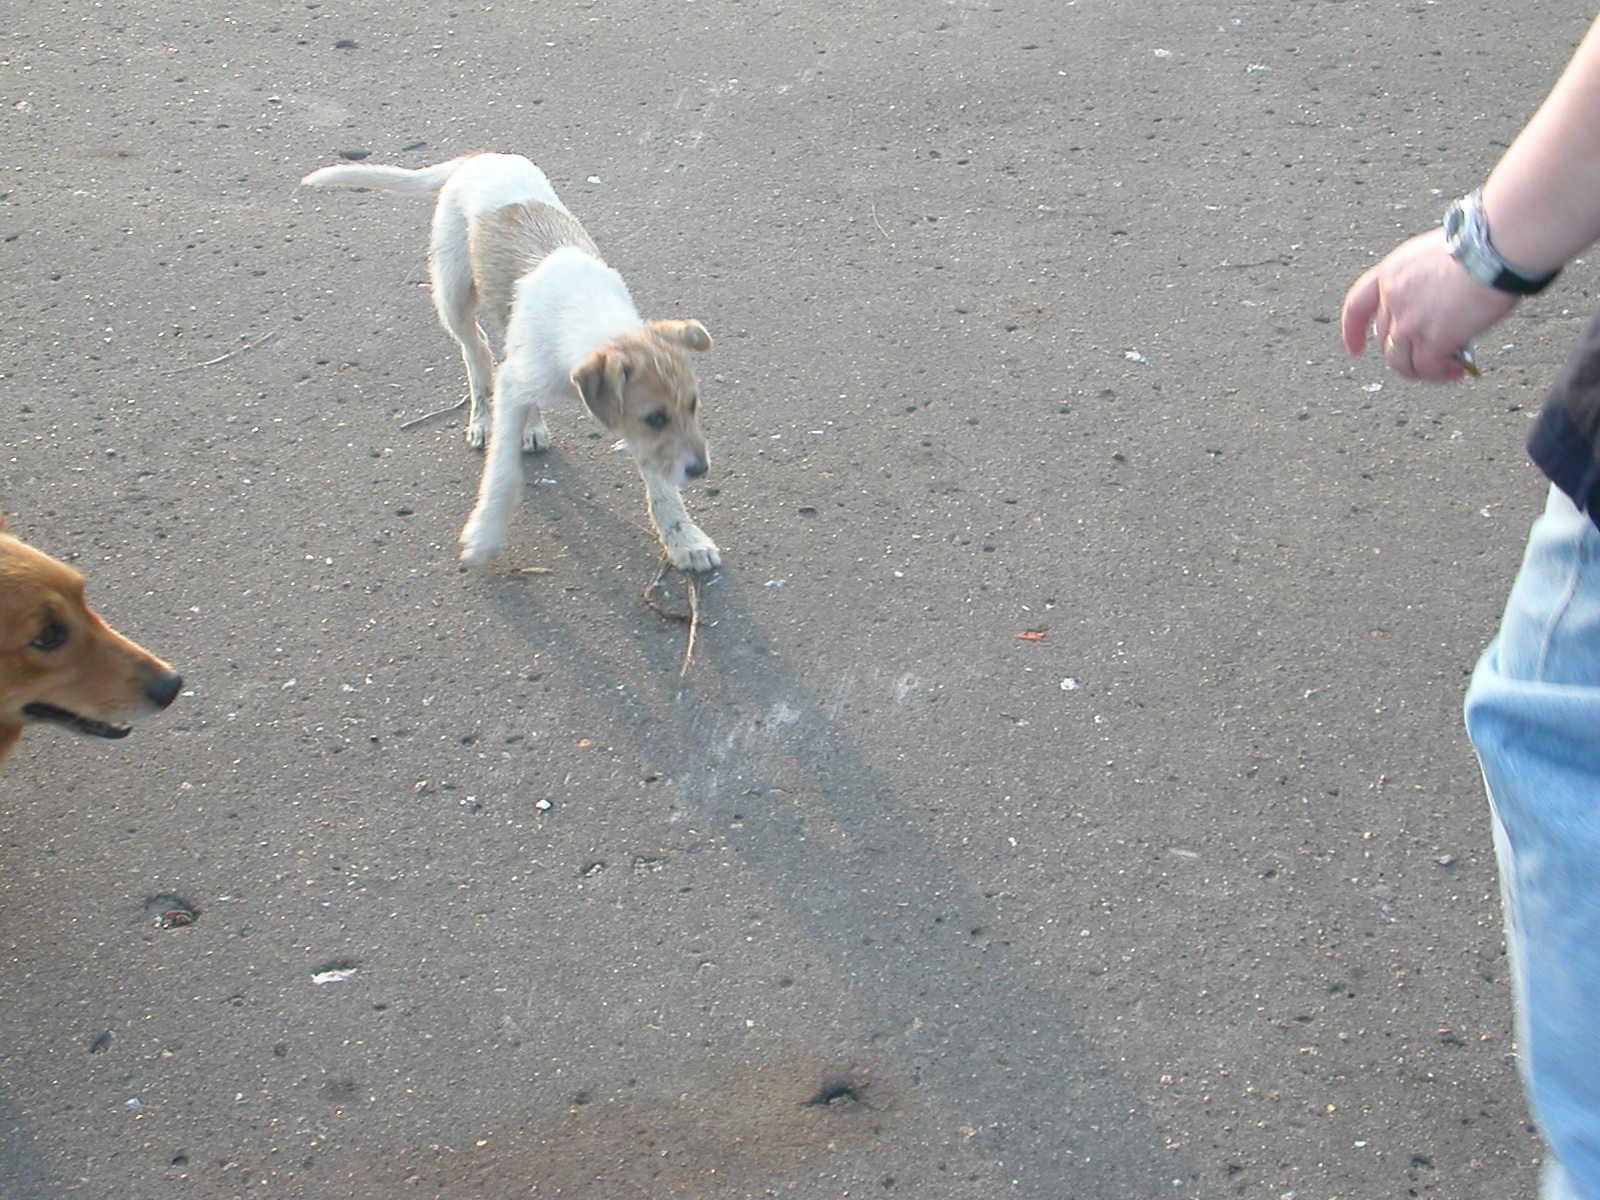 Streunende Hunde in der Flussnähe, hungrig und voll Flöhe